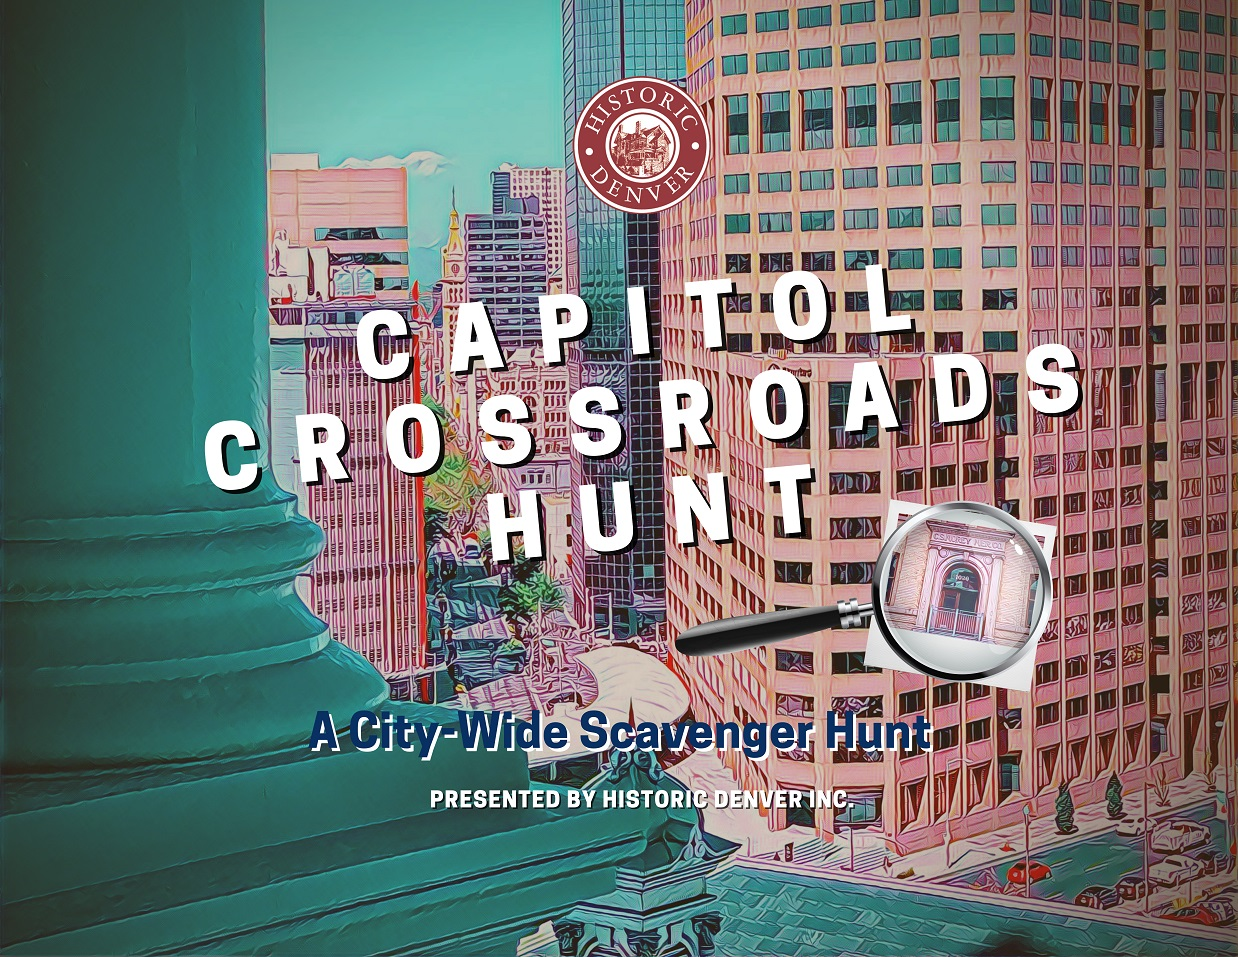 Capitol Crossroads Scavenger Hunt